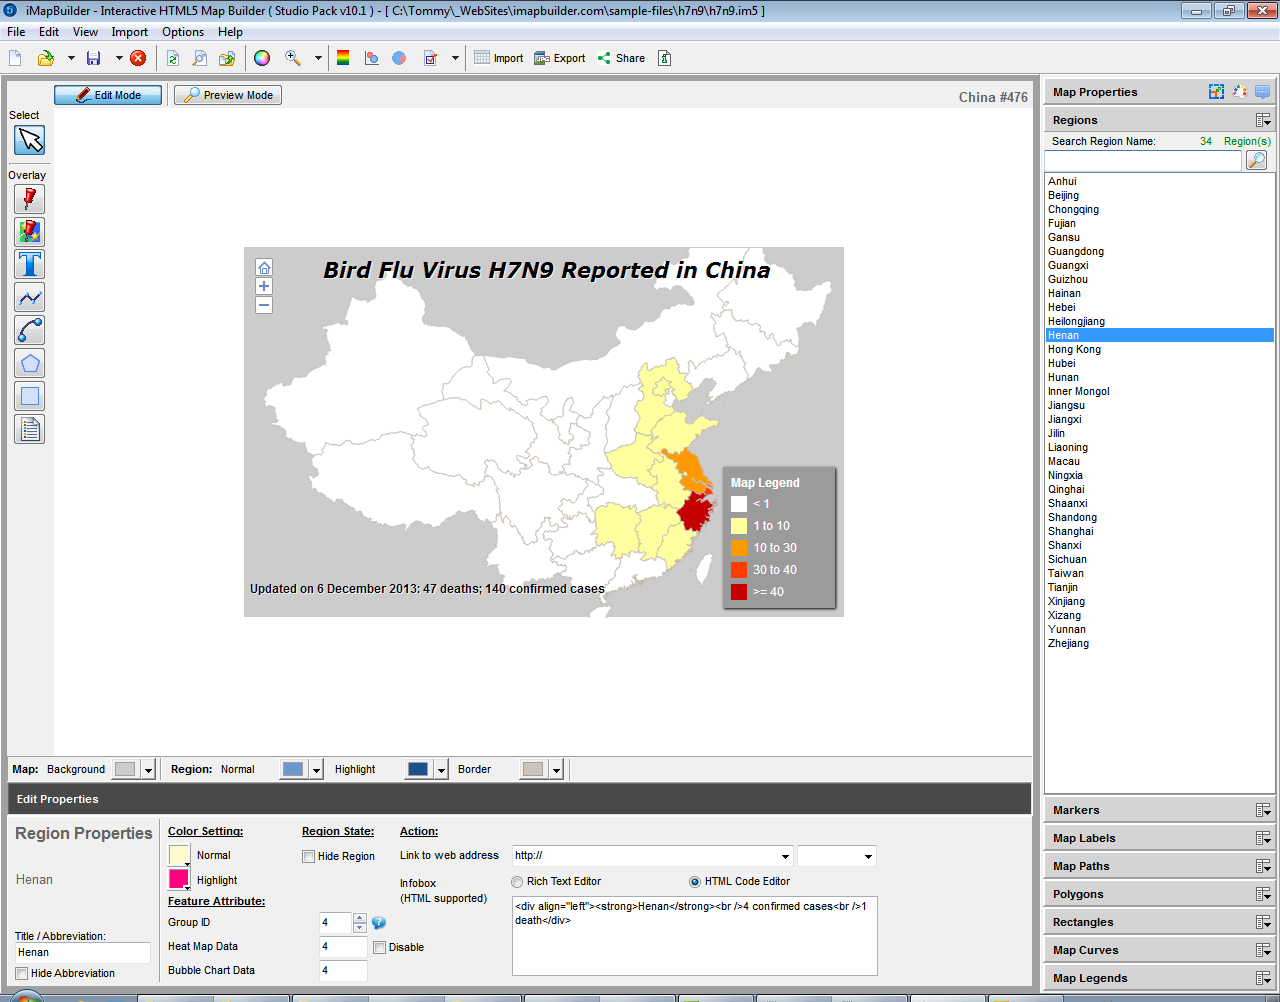 iMapBuilder Interactive HTML5 Map Builder, Presentation Software Screenshot